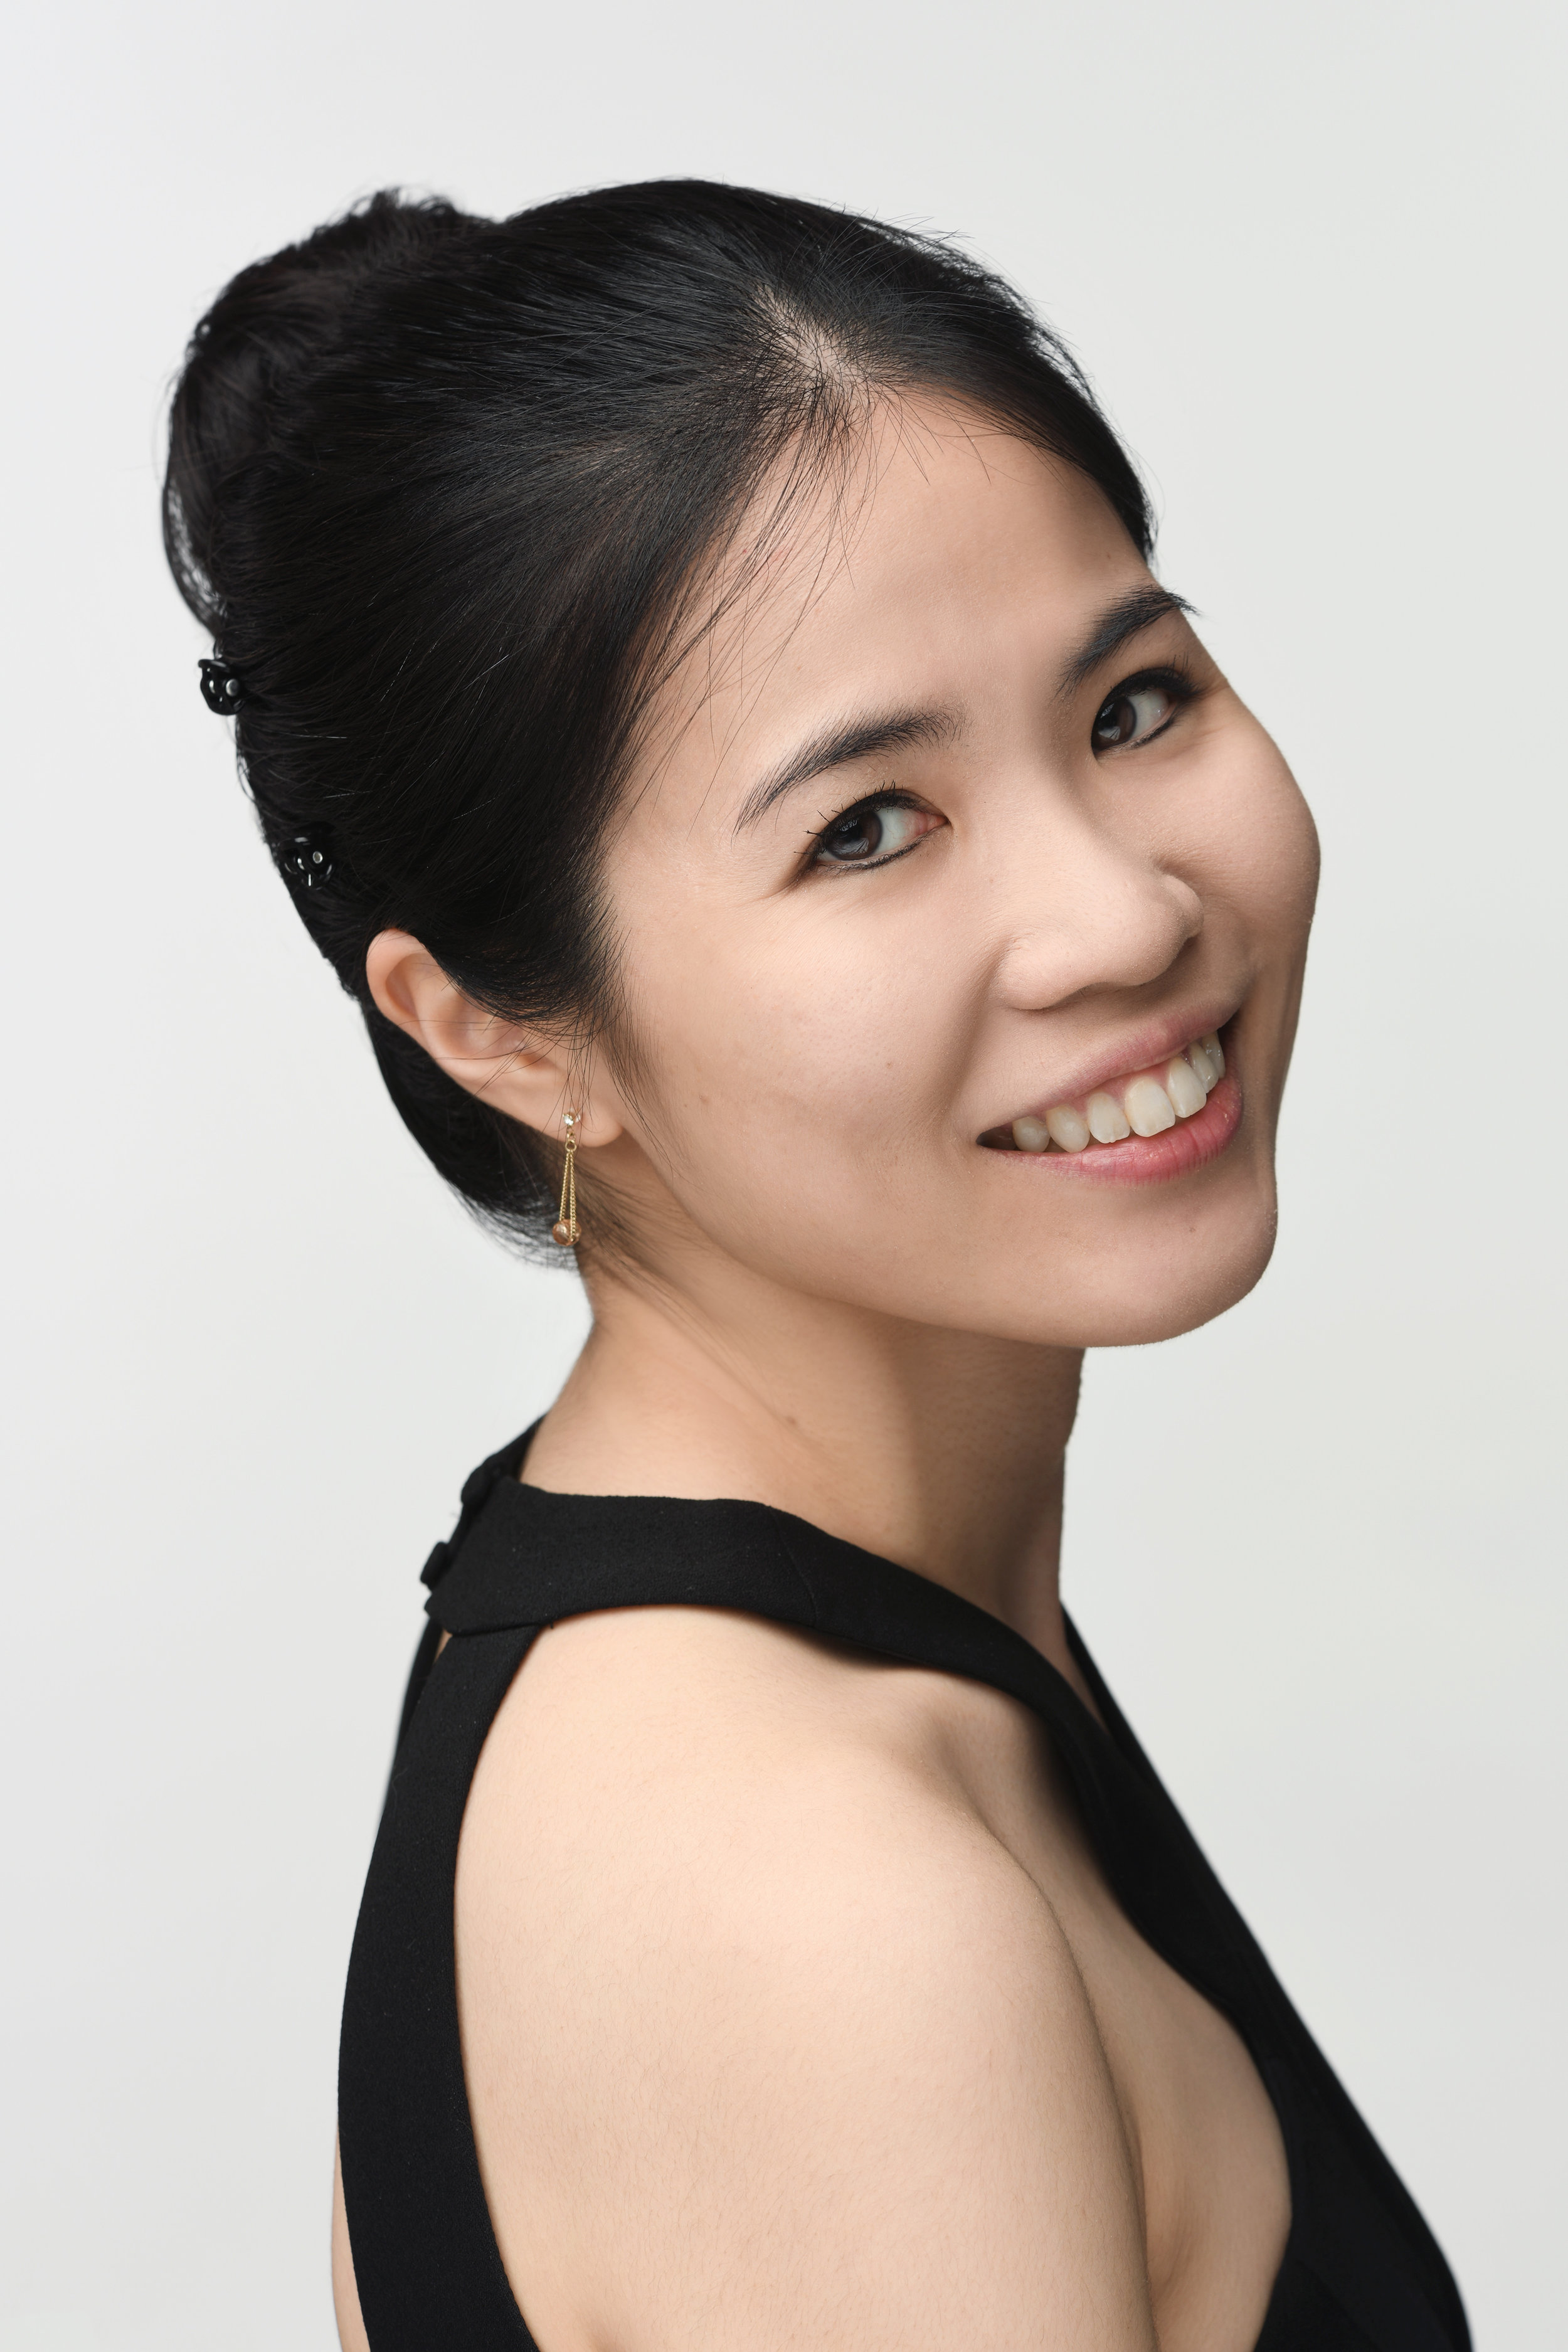 DOWNLOAD MIKA SASAKI PIANO JPG   PHOTO CREDIT: NIR ARIELI